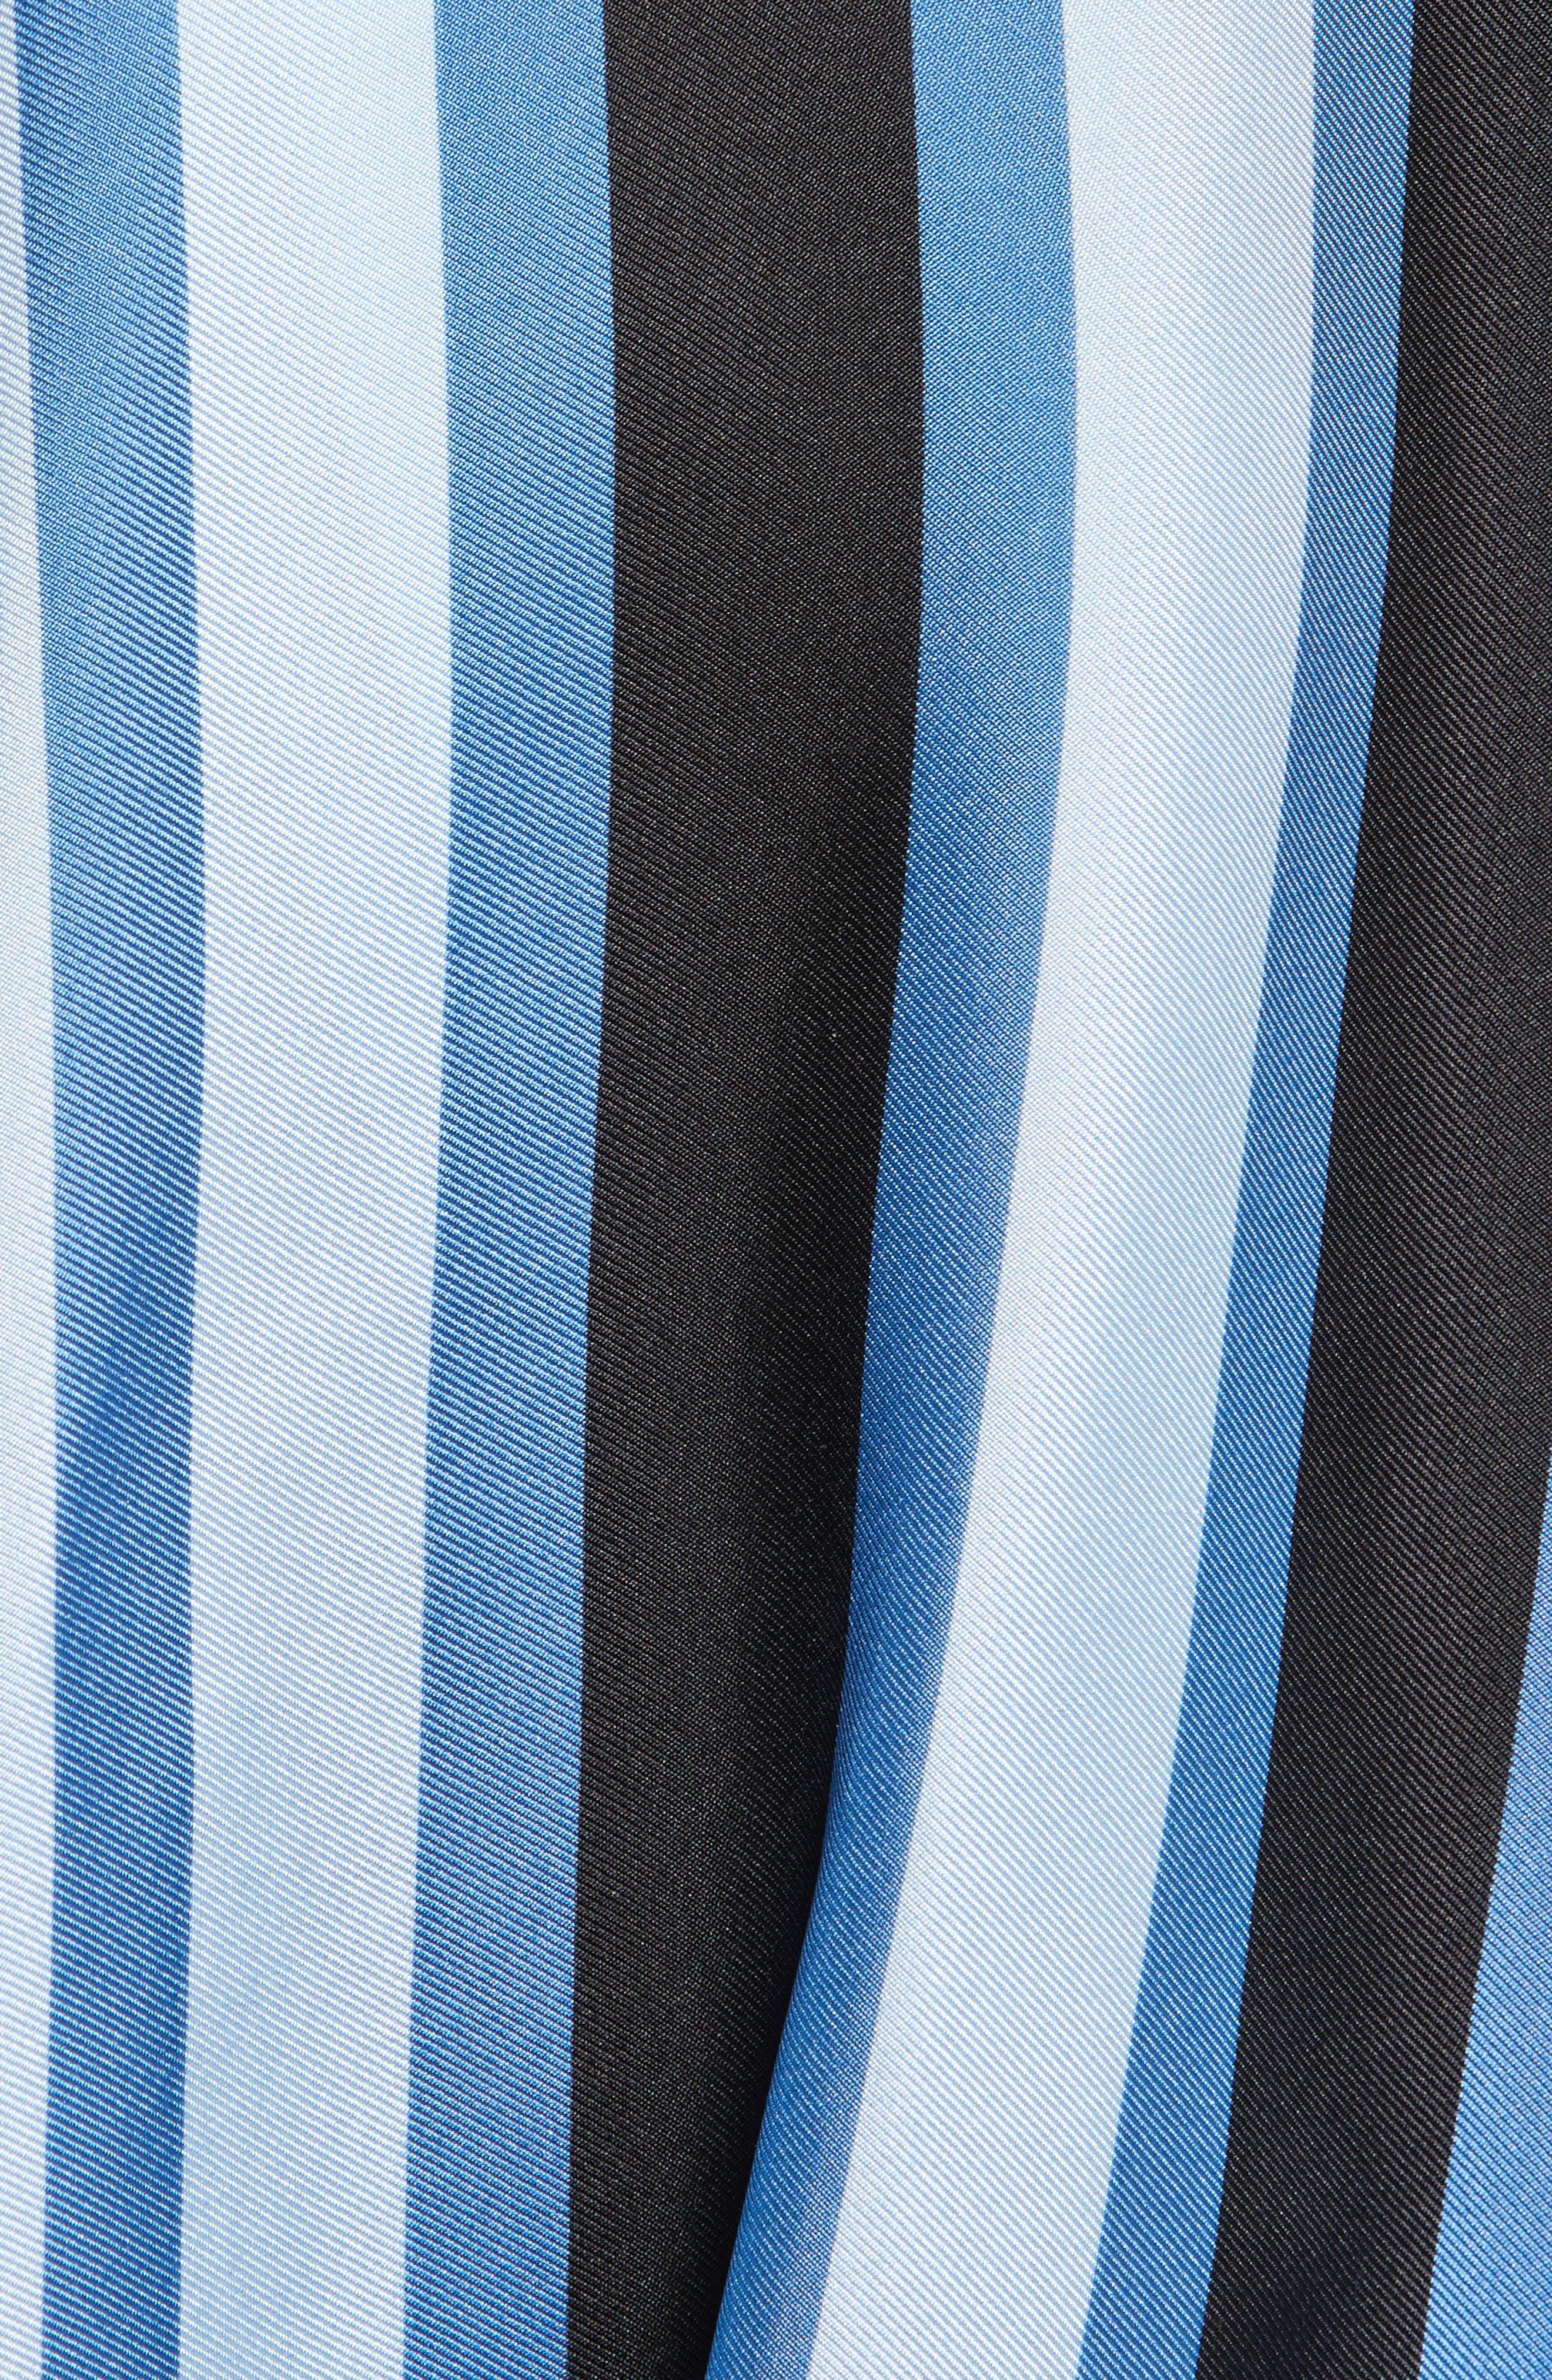 Asymmetrical Stripe Silk Maxi Dress,                             Alternate thumbnail 5, color,                             451